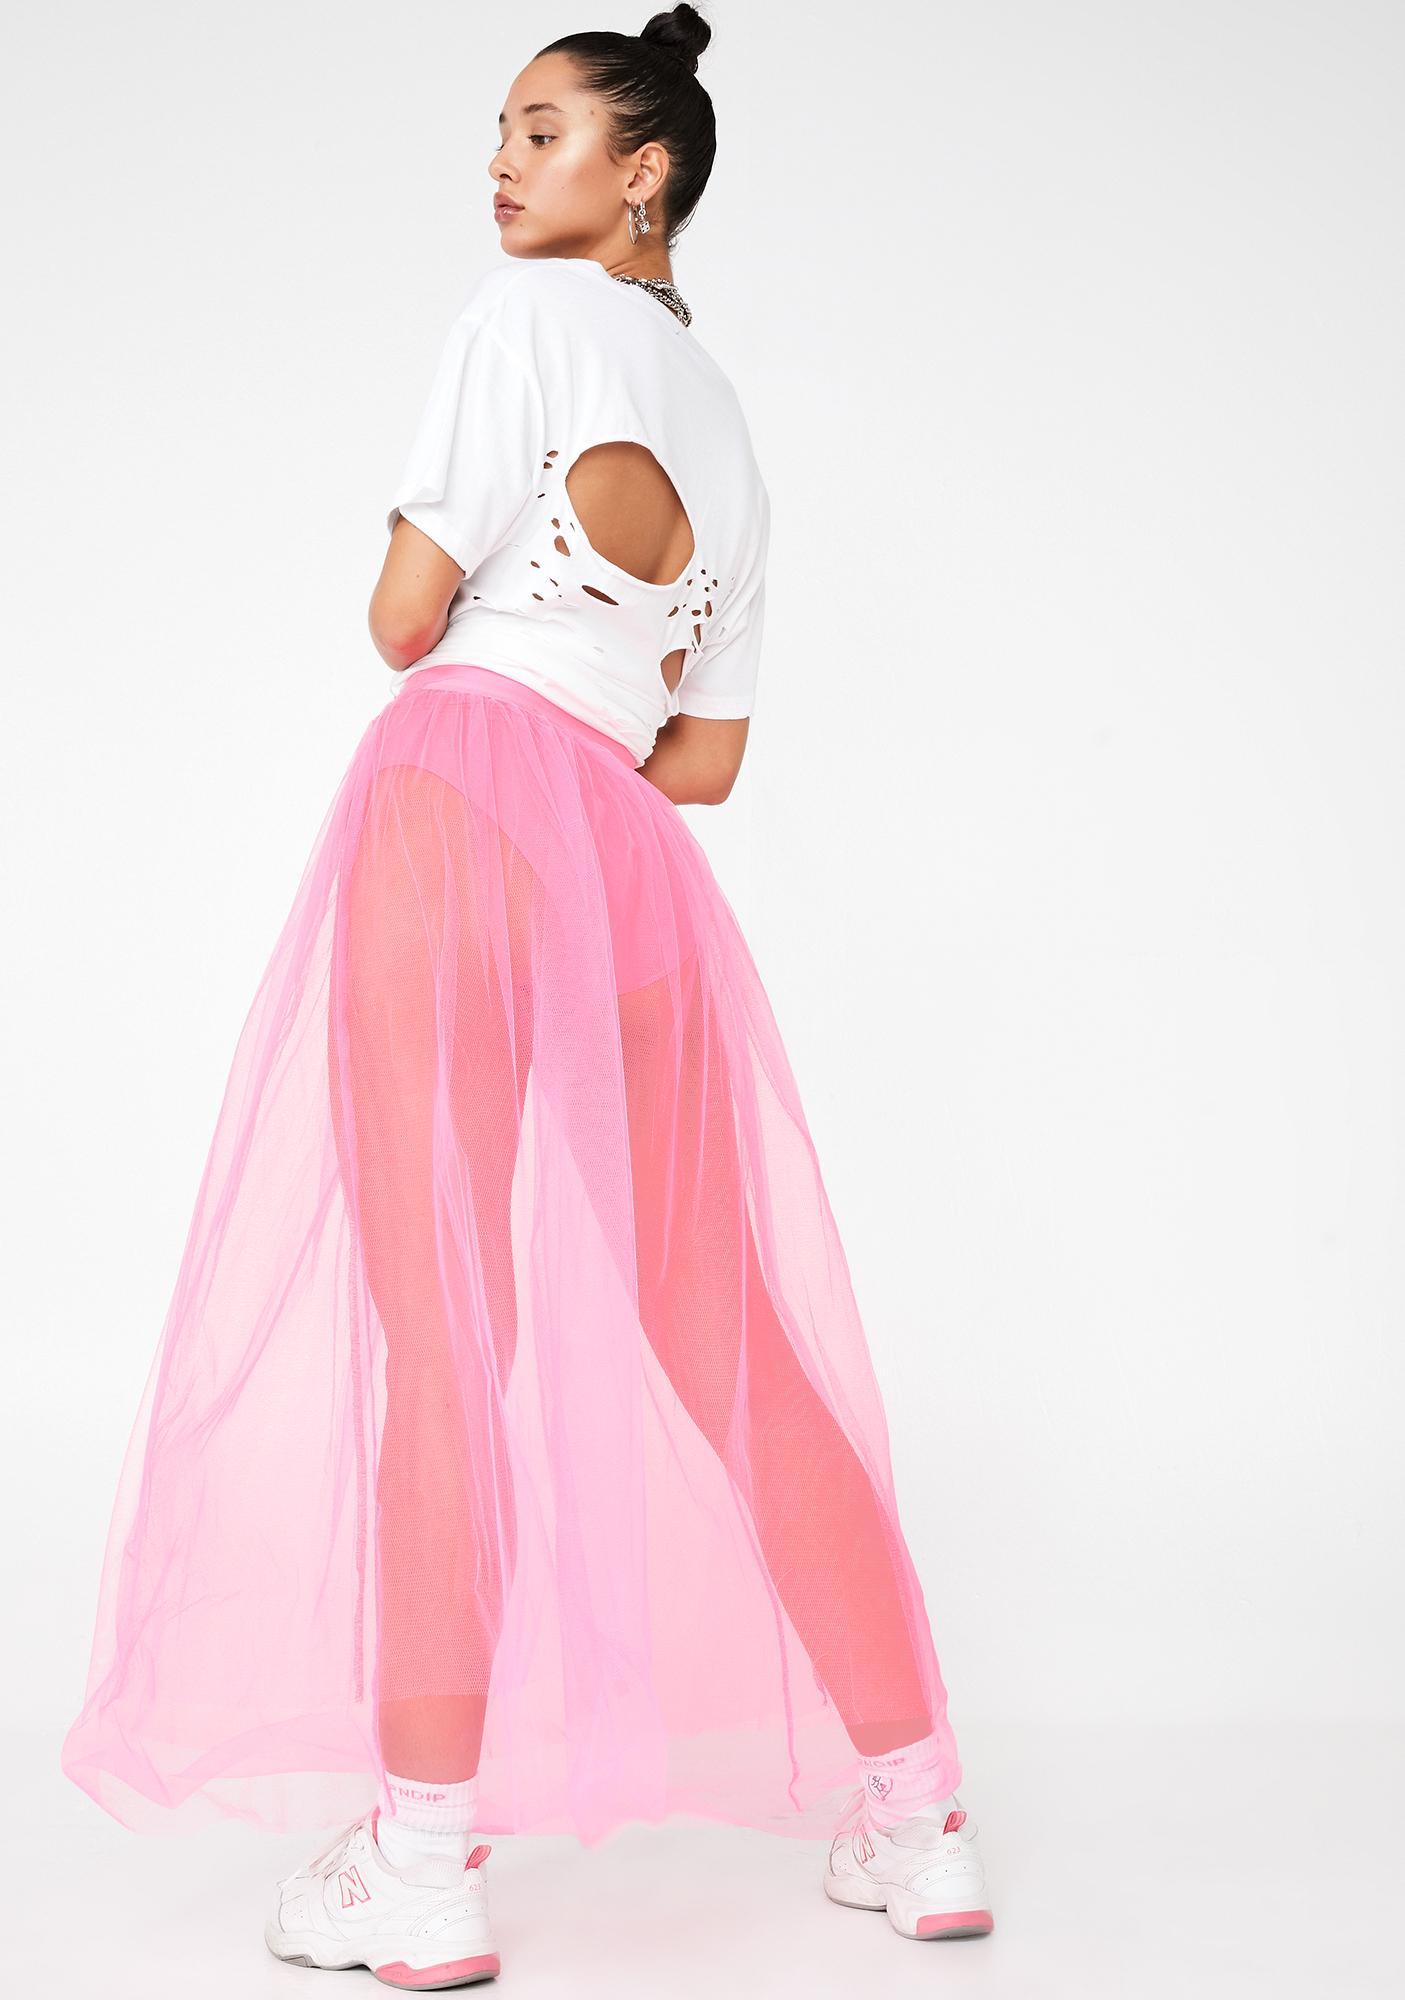 Sweet Vicious Vapor Tulle Skirt